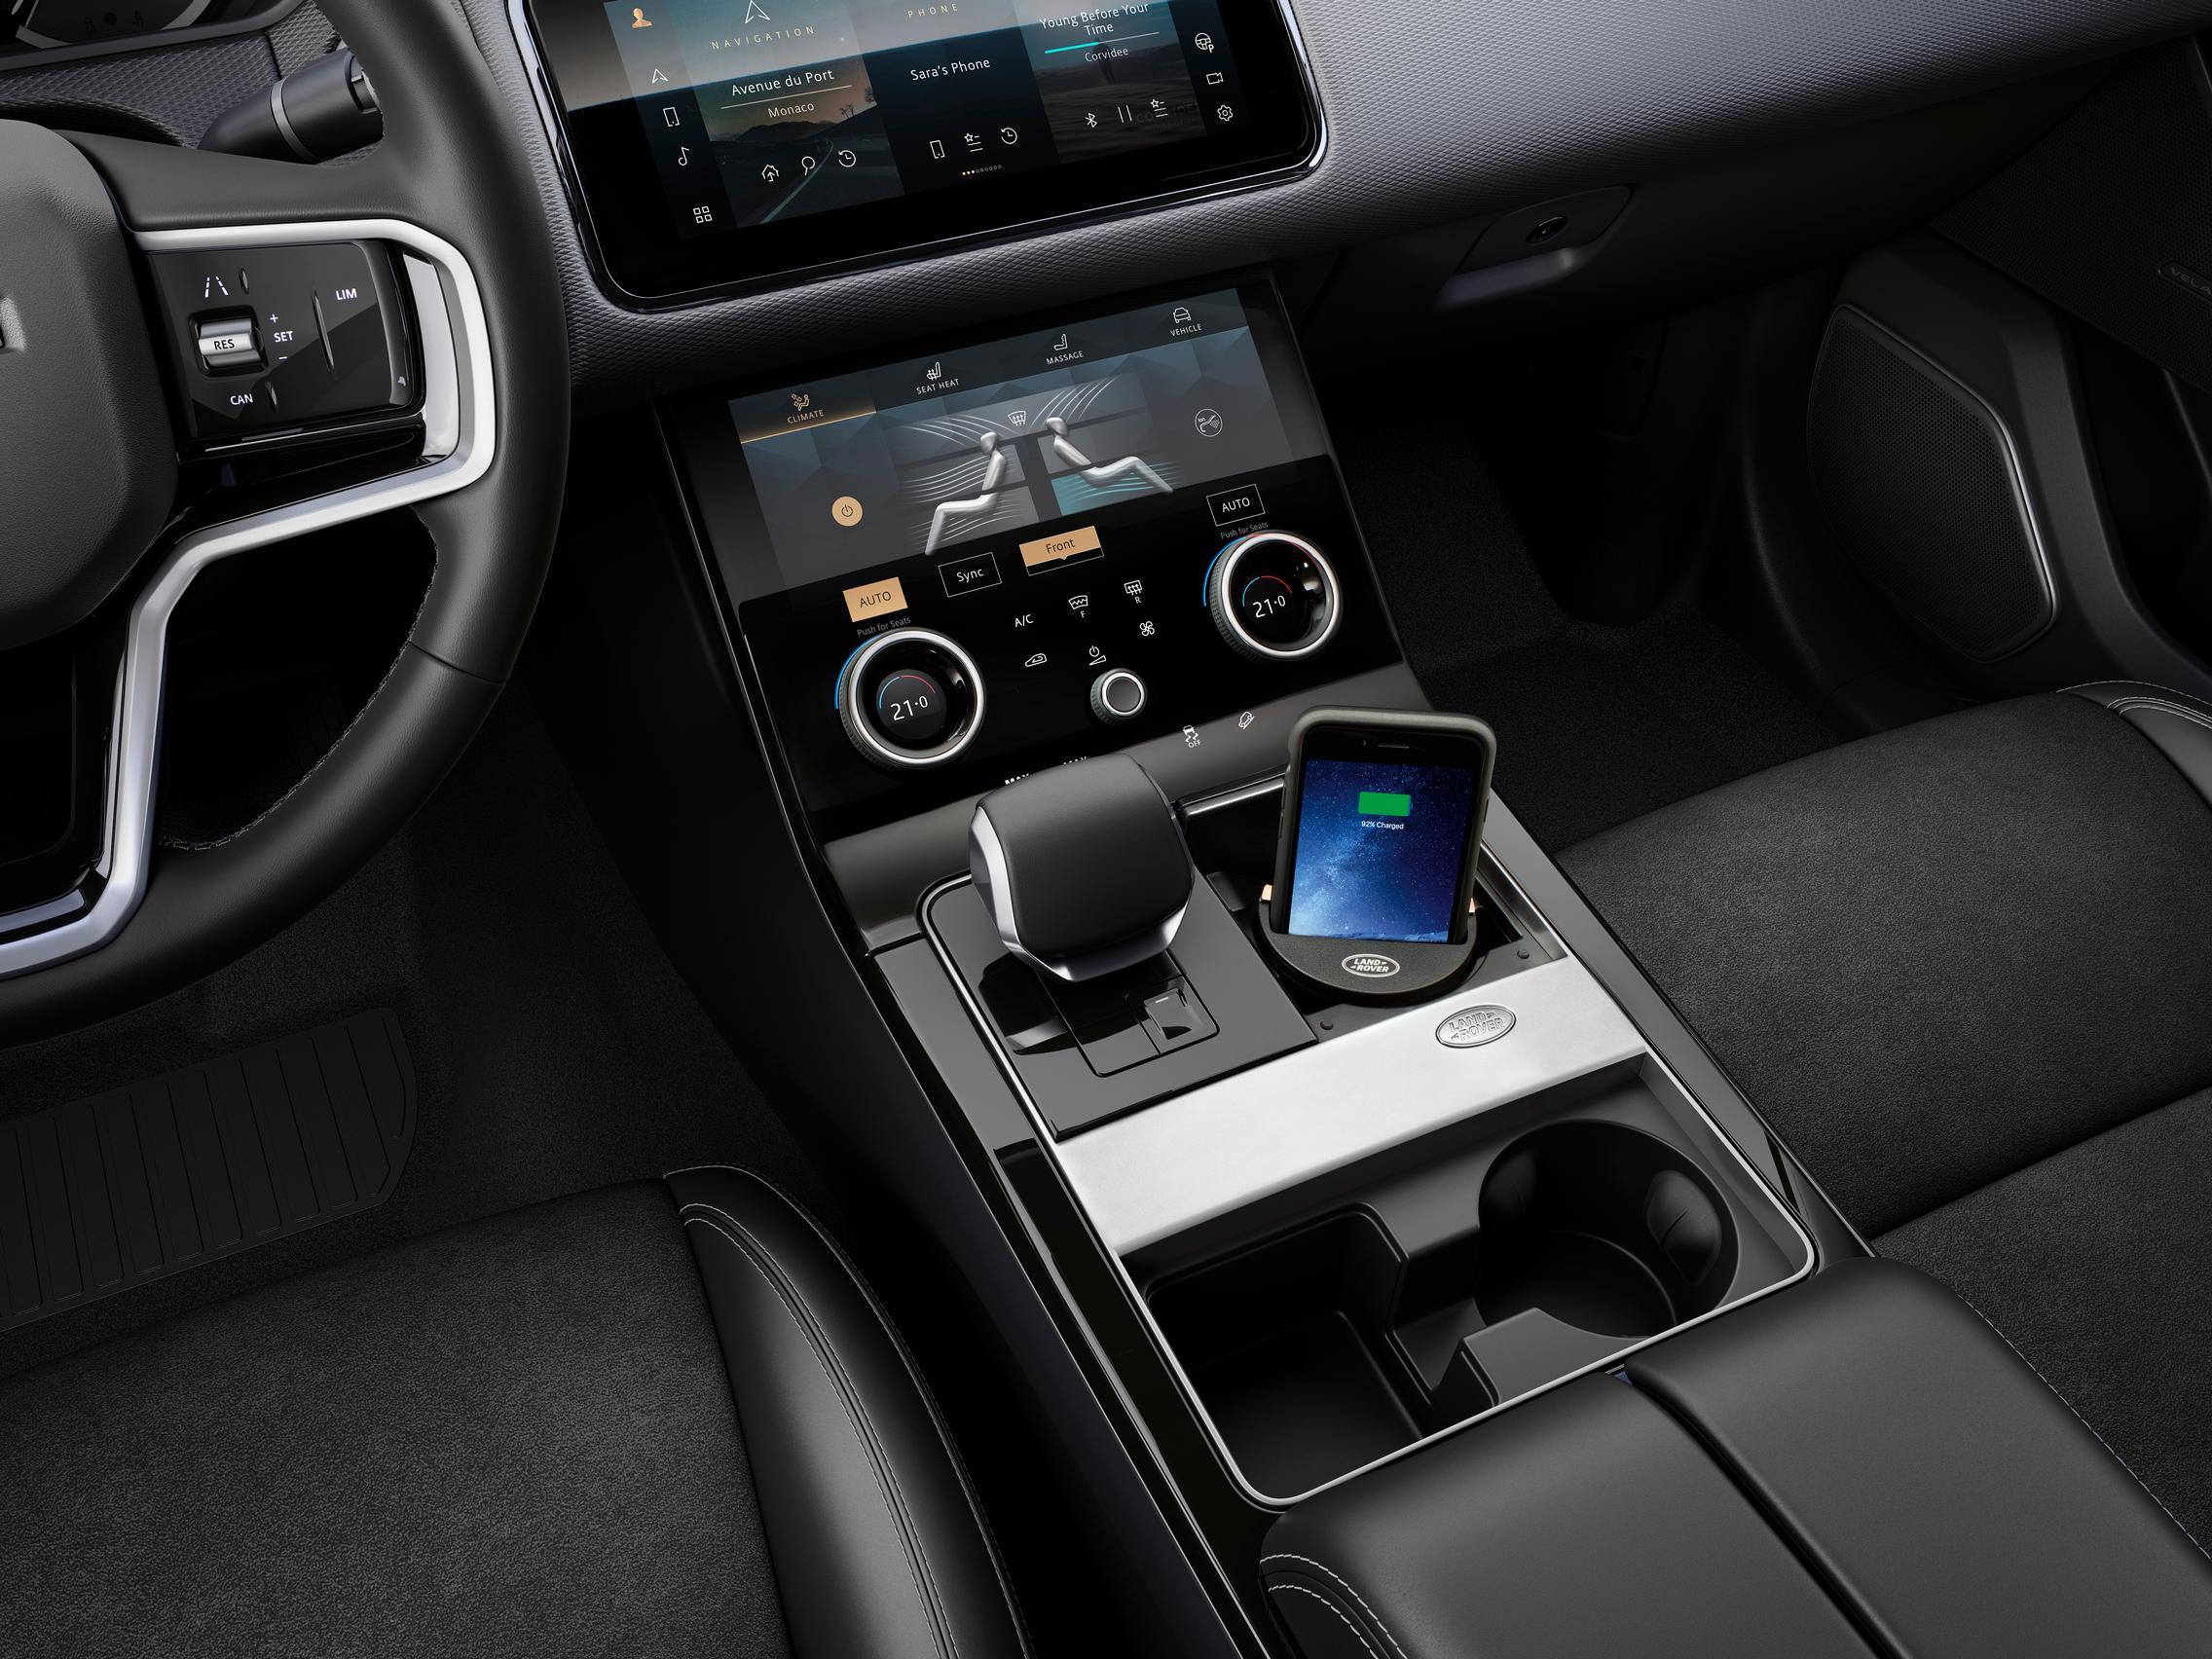 2021 Range Rover Velar Center Console